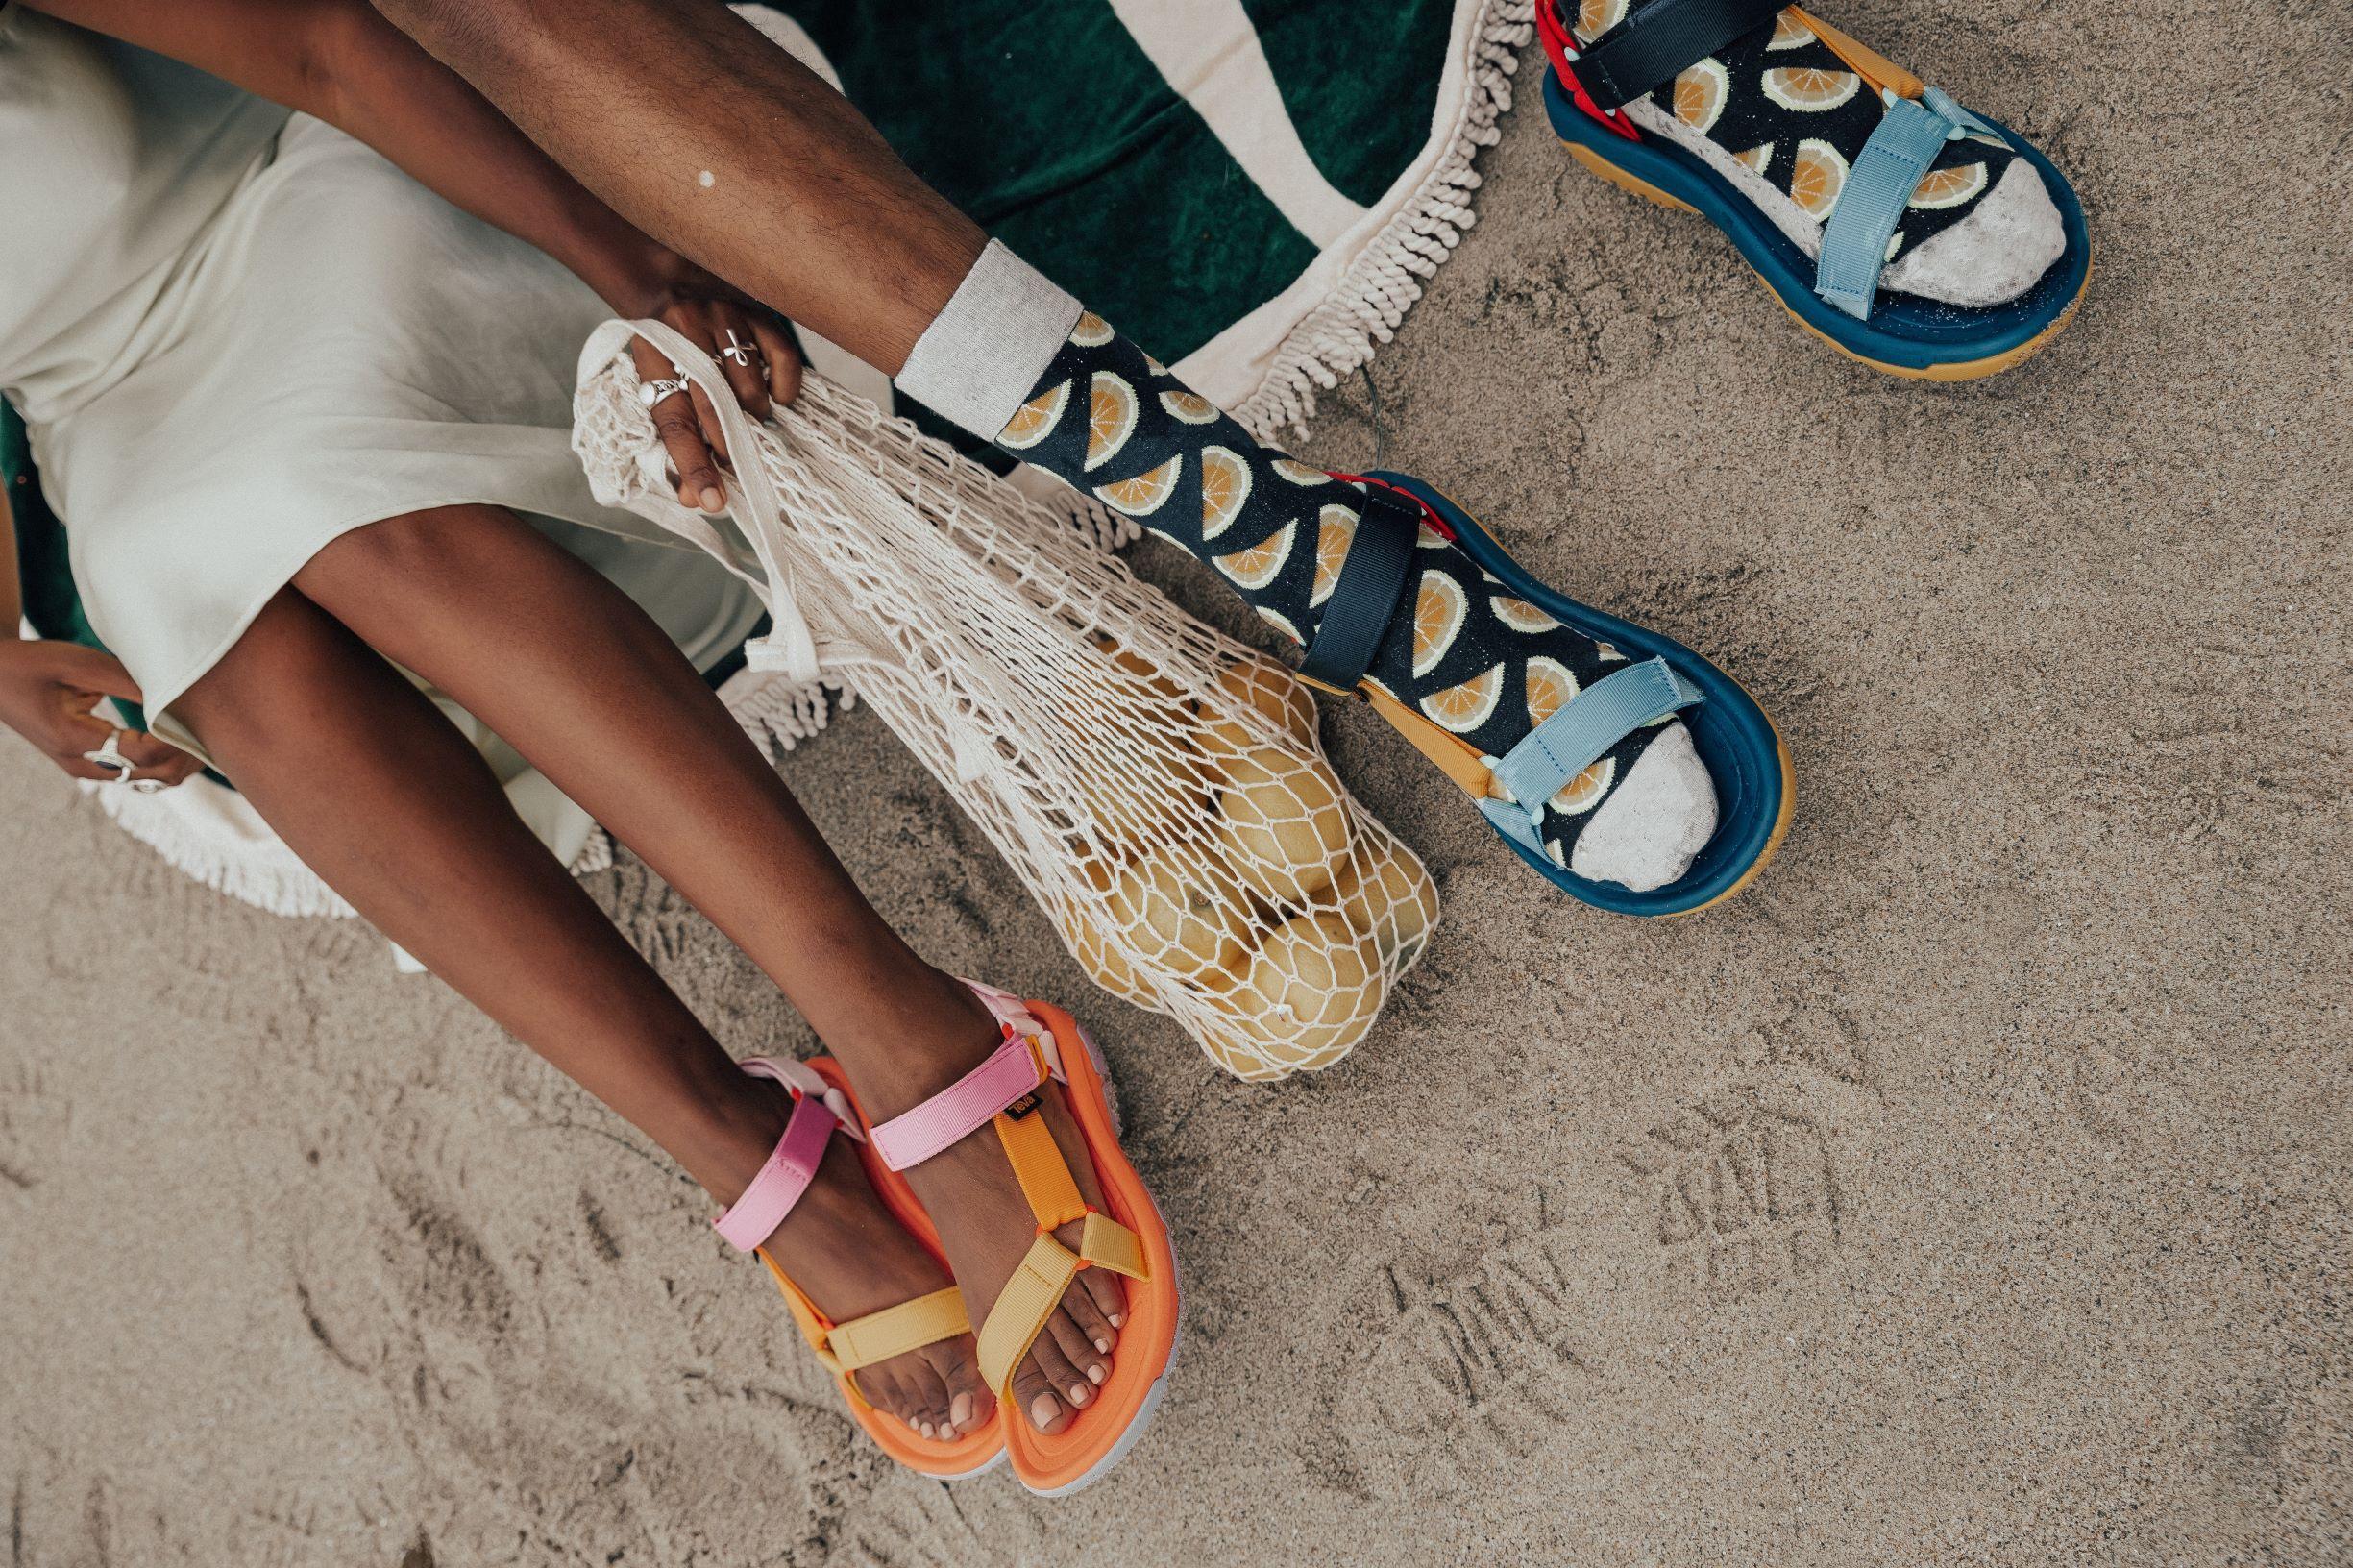 Feelin Beachy Keen In The New Ov X Teva Collab Sandals Teva Hiking Shoes Women Best Running Shoes